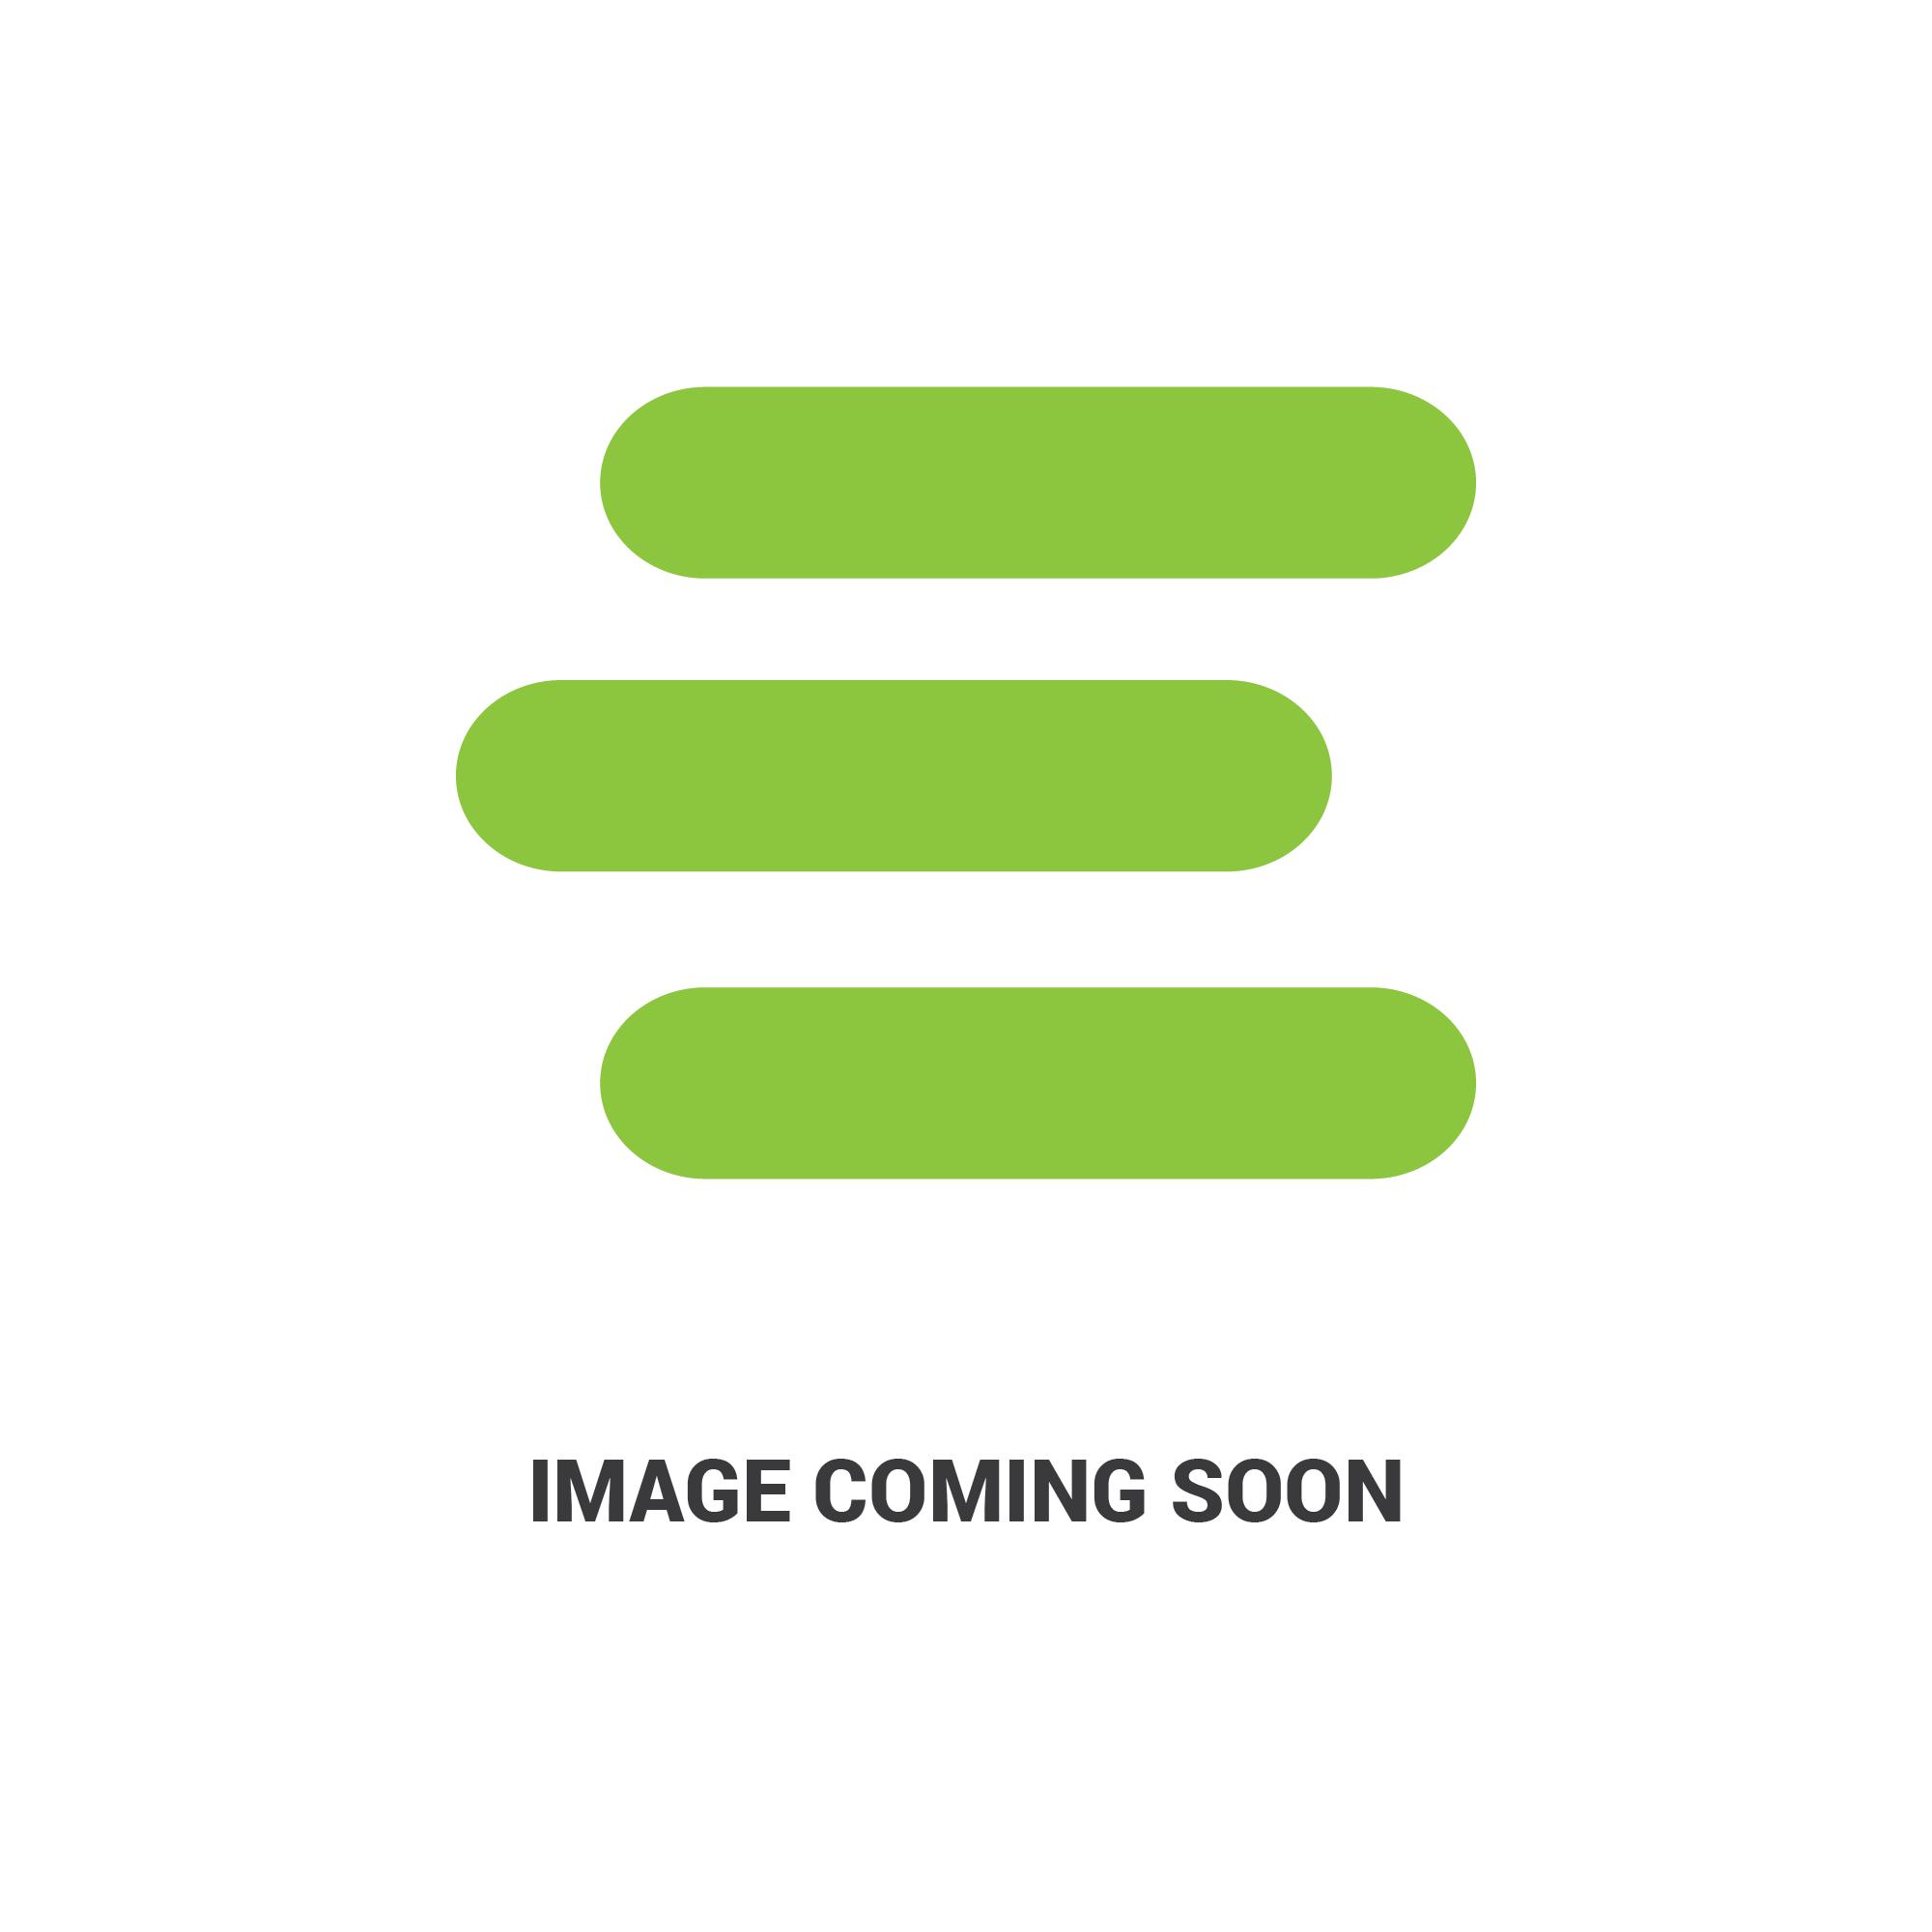 E-3J080-10872edit 1137.jpg